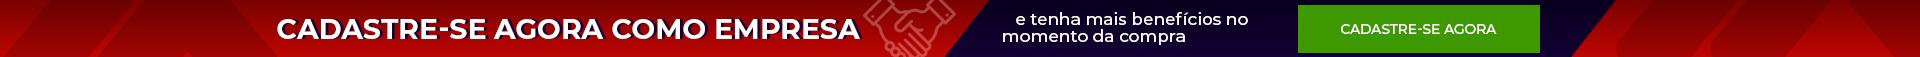 tagtopodesktop